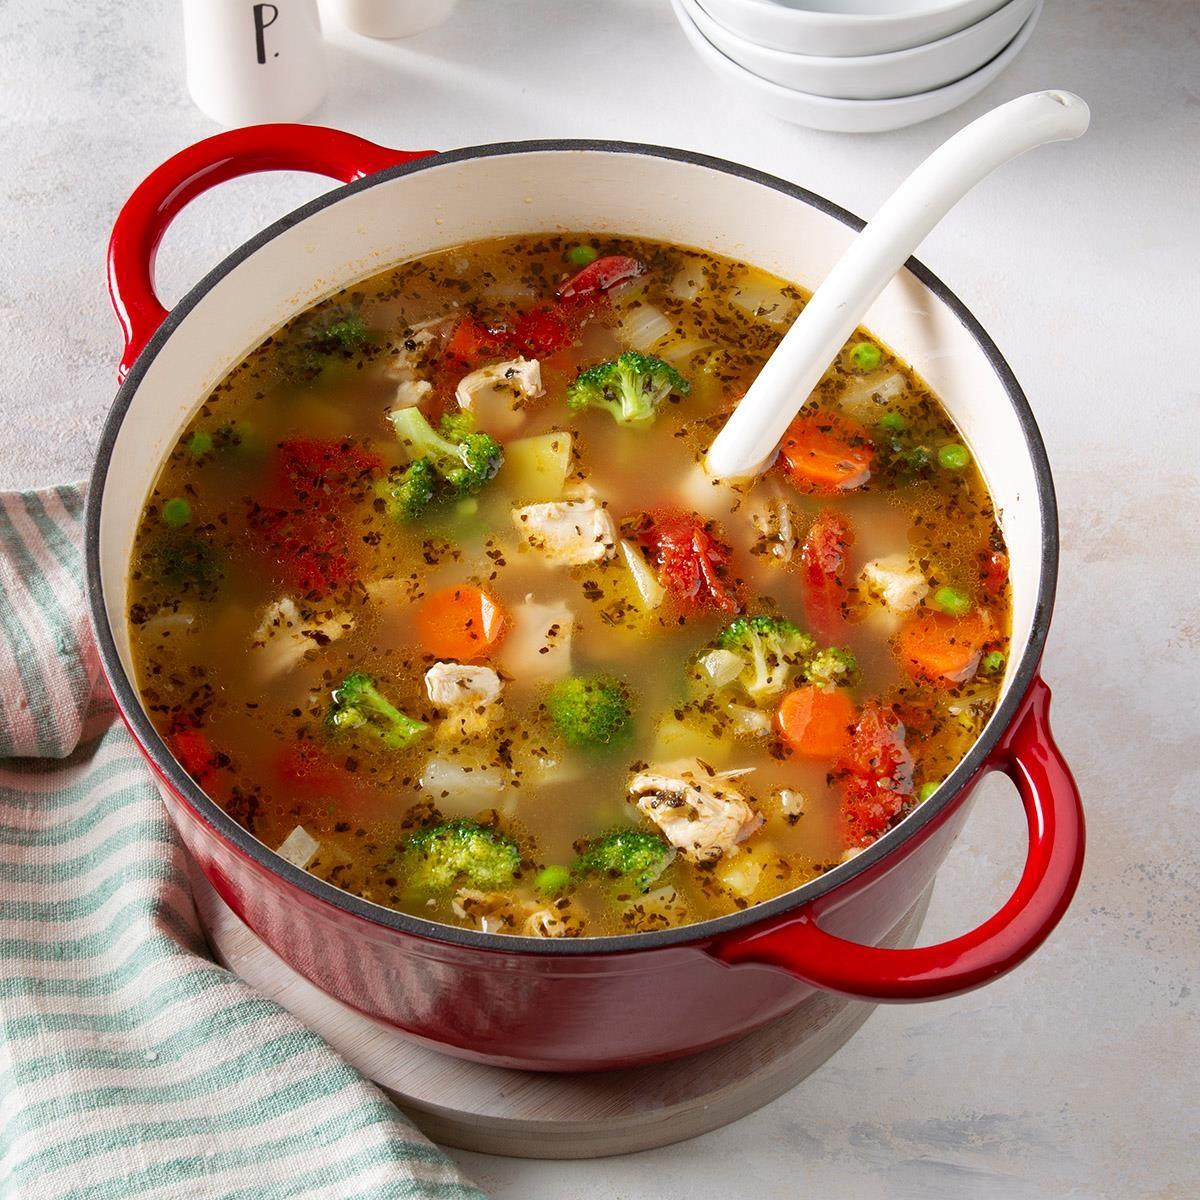 Potluck Chicken Vegetable Soup